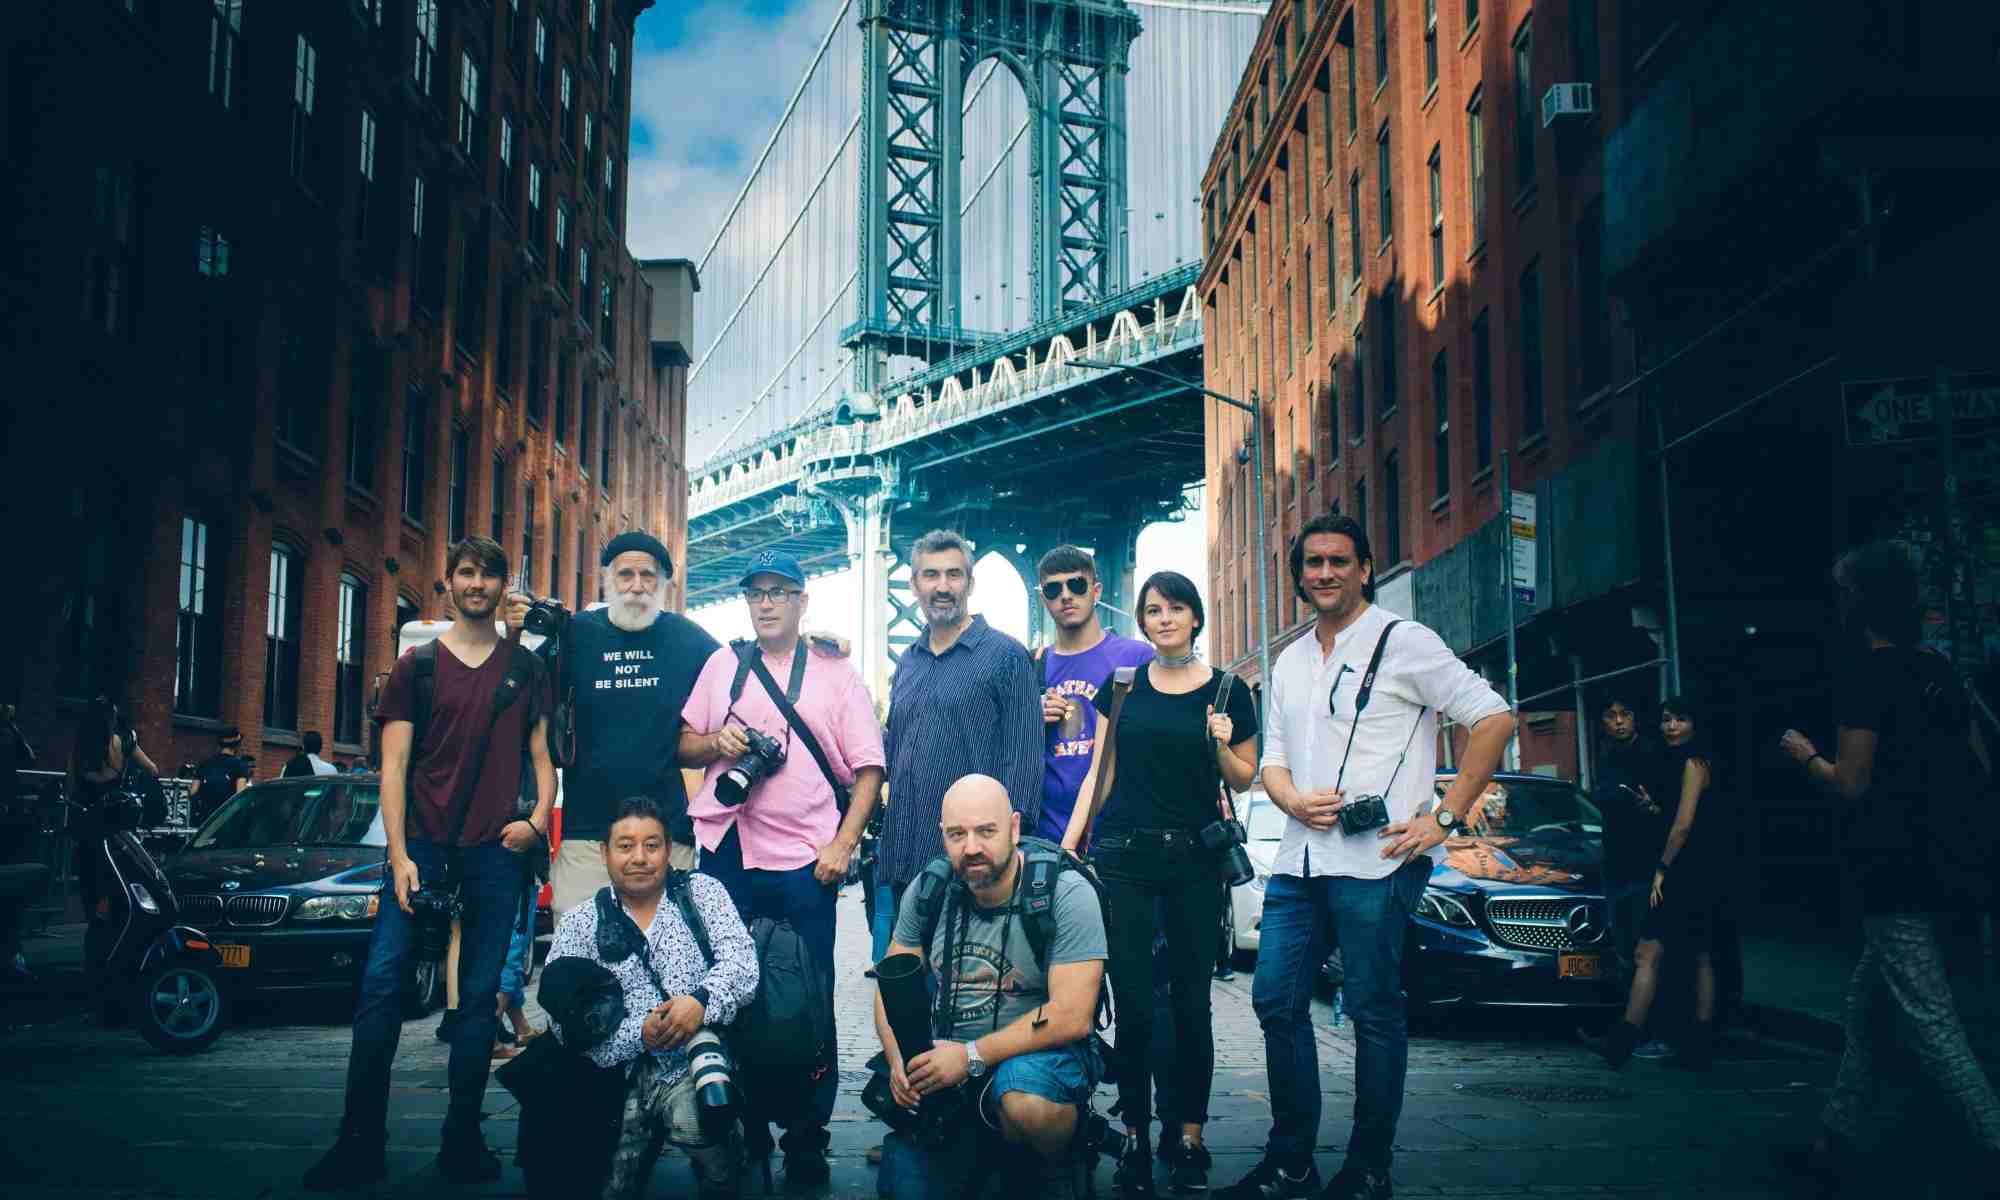 New York street photography workshop